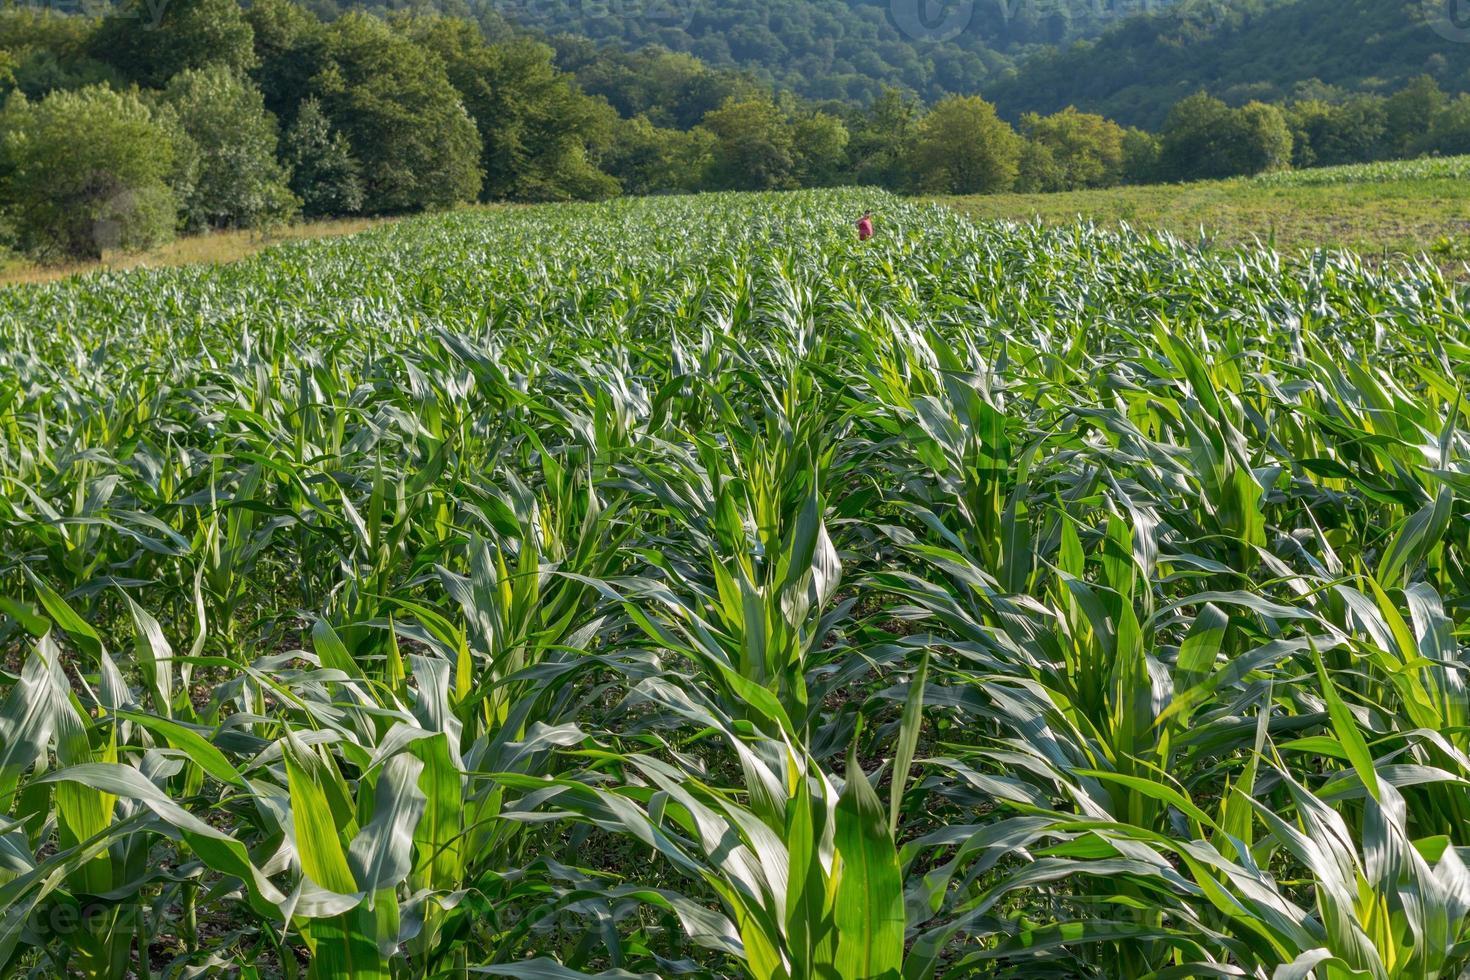 landscape - corn field near the forest photo